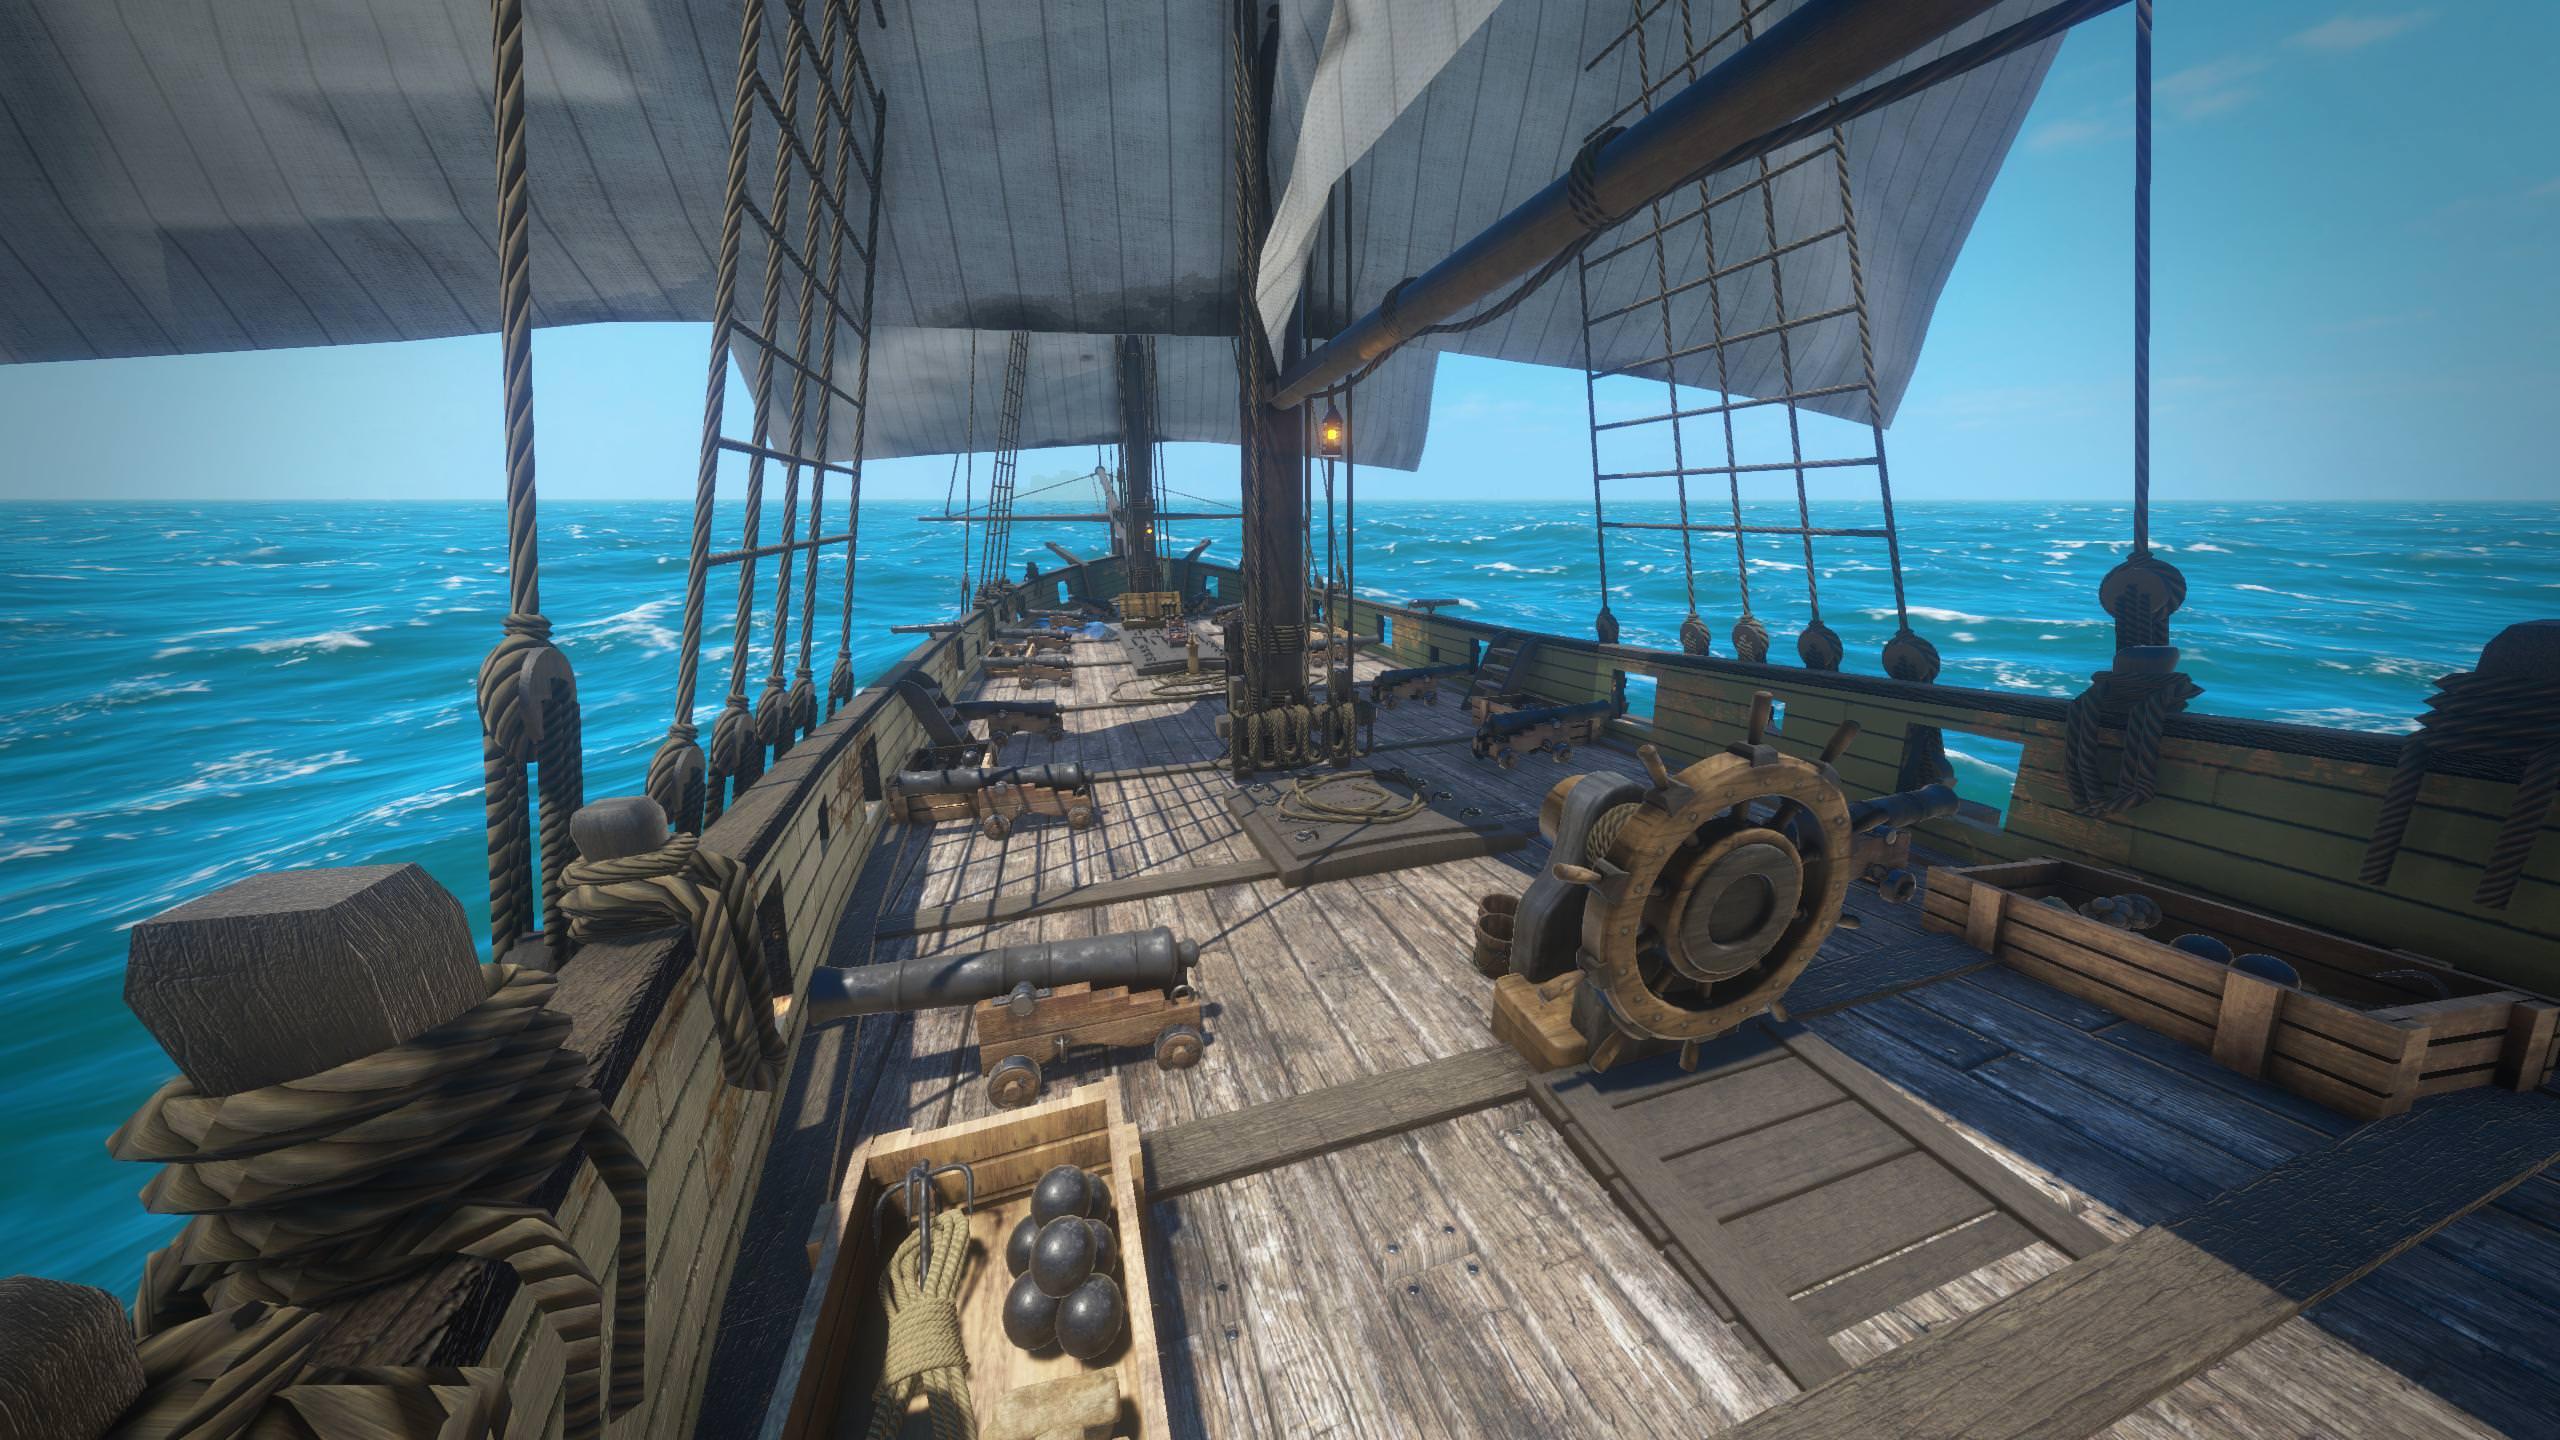 Палуба на корабле картинки